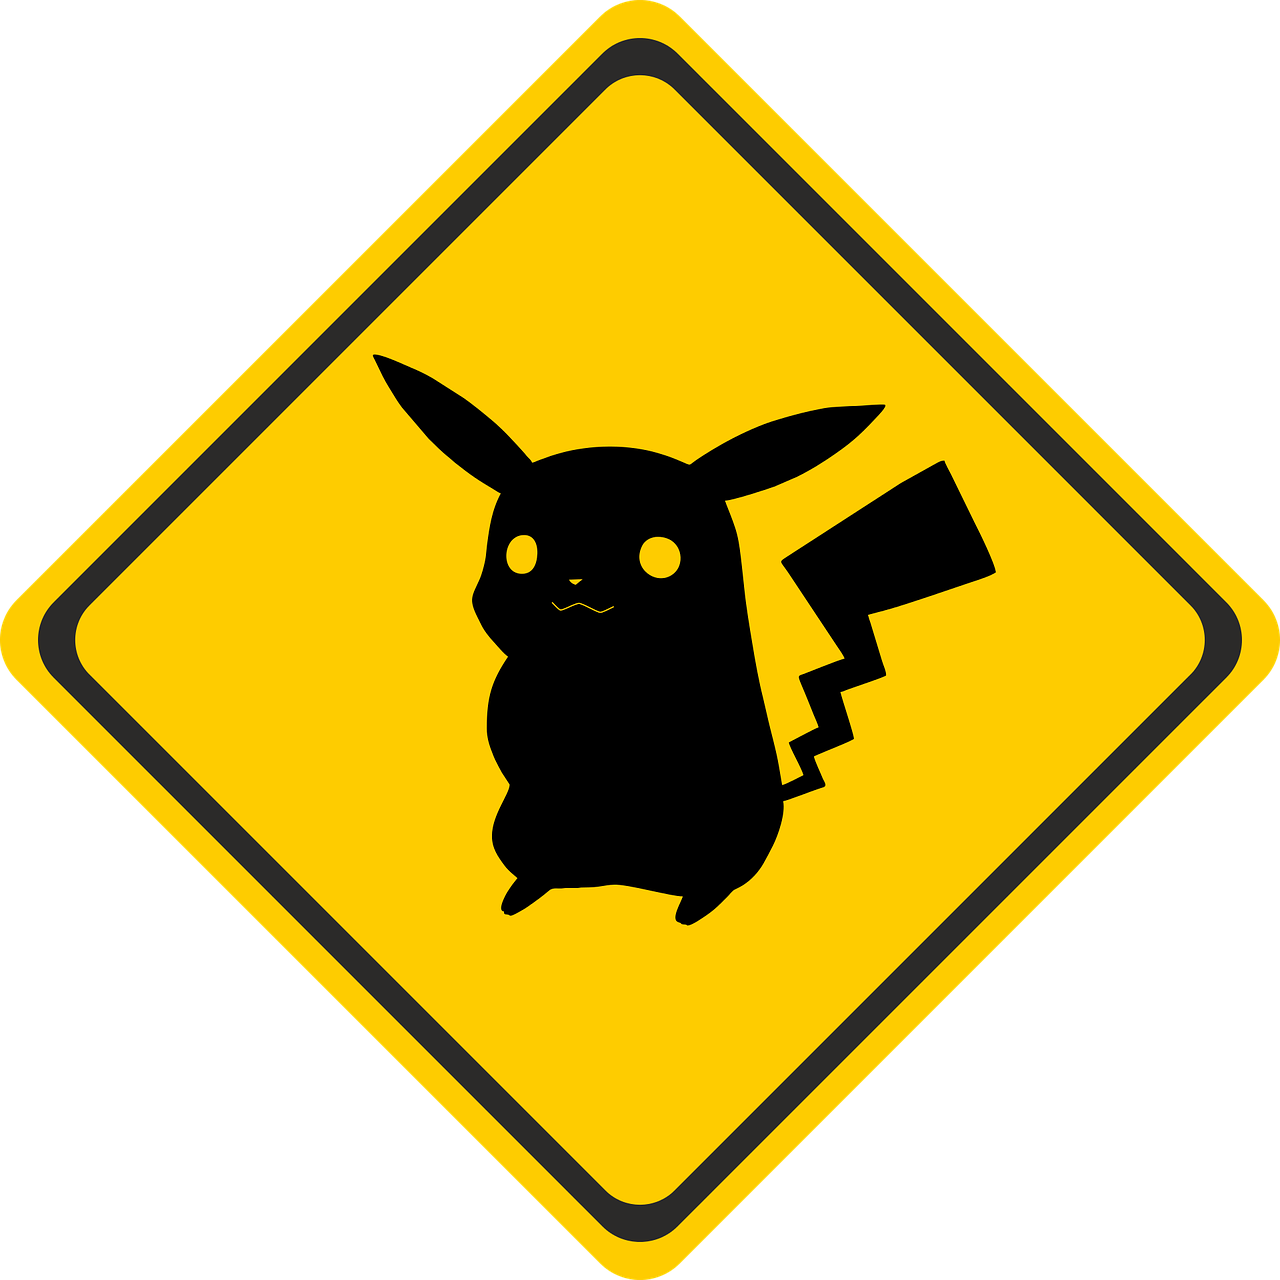 A Pokemon on a street sign